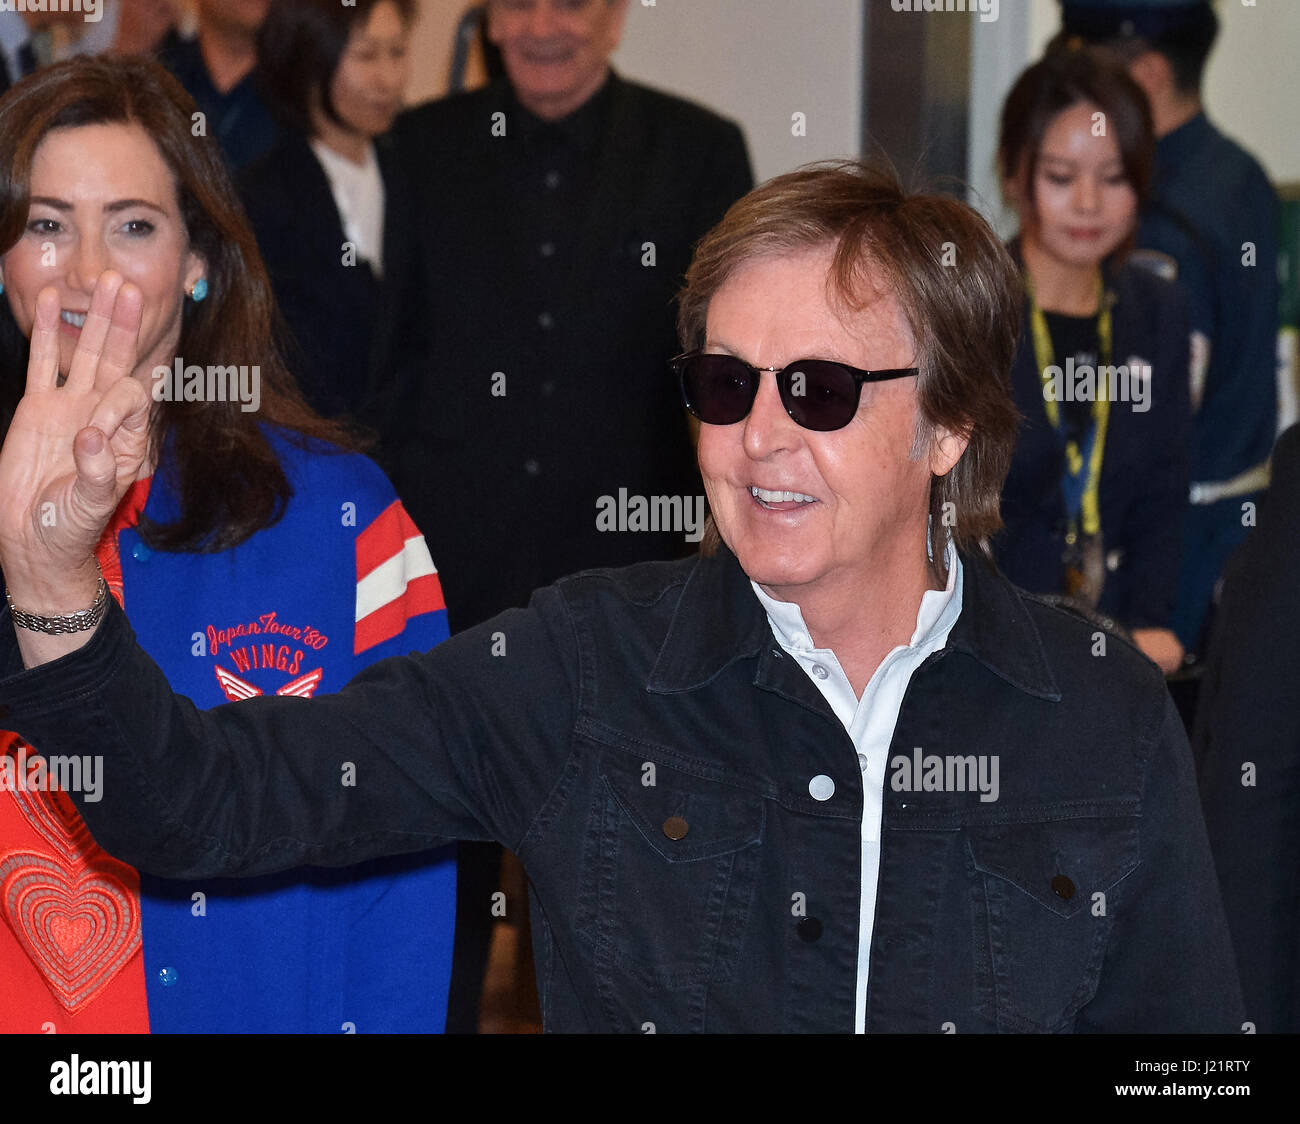 Tokyo, Japan. 23rd Apr, 2017. Paul McCartney, Tokyo, Japan, April 23, 2017 : Sir Paul McCartney arrives at Tokyo - Stock Image